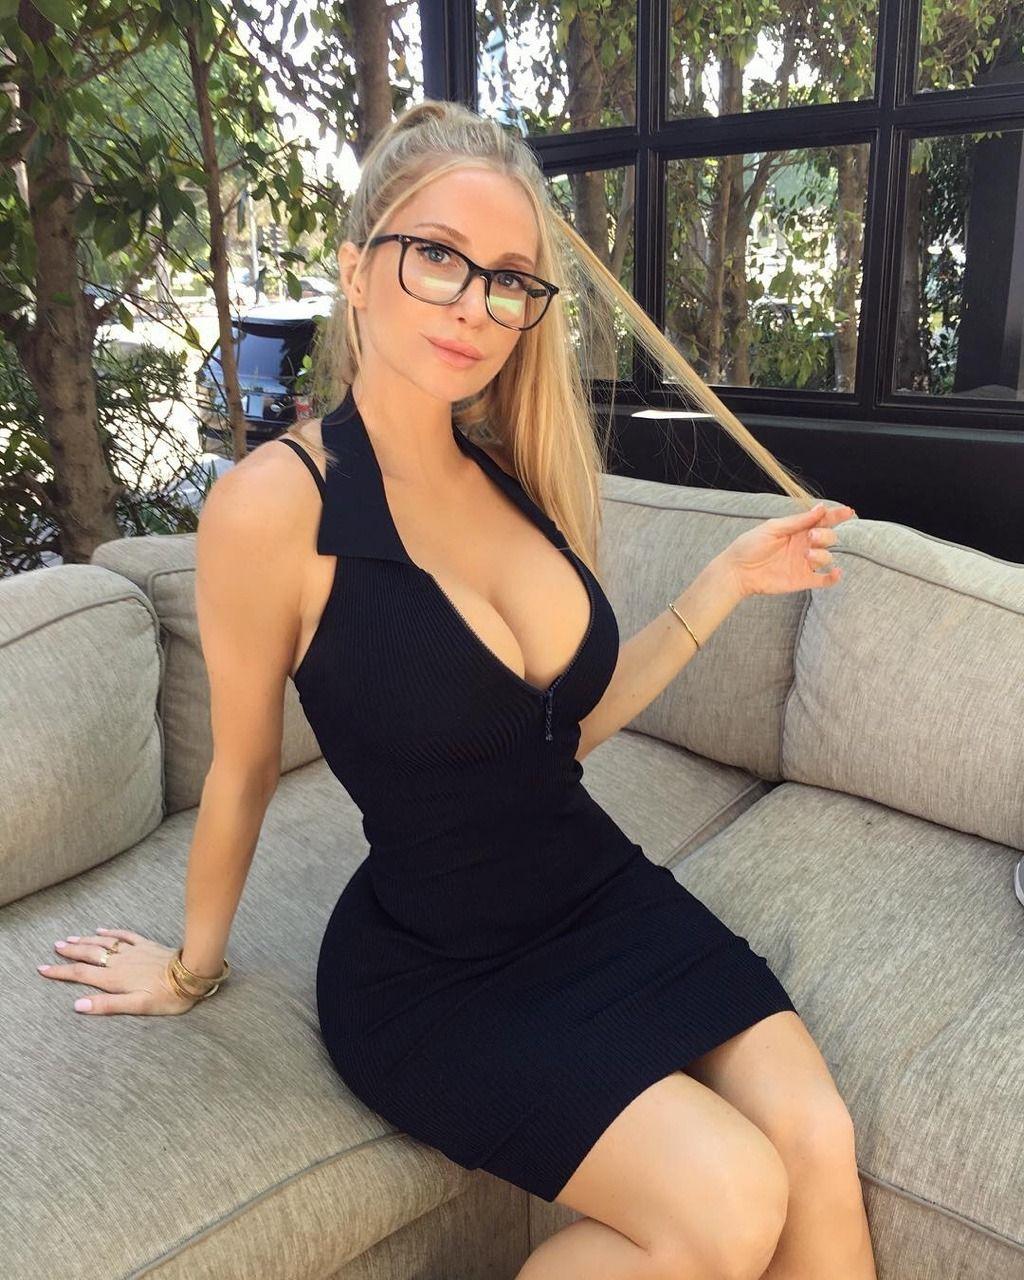 Amanda Elise Porn amanda elise lee aka amanda fitness looks stunning in